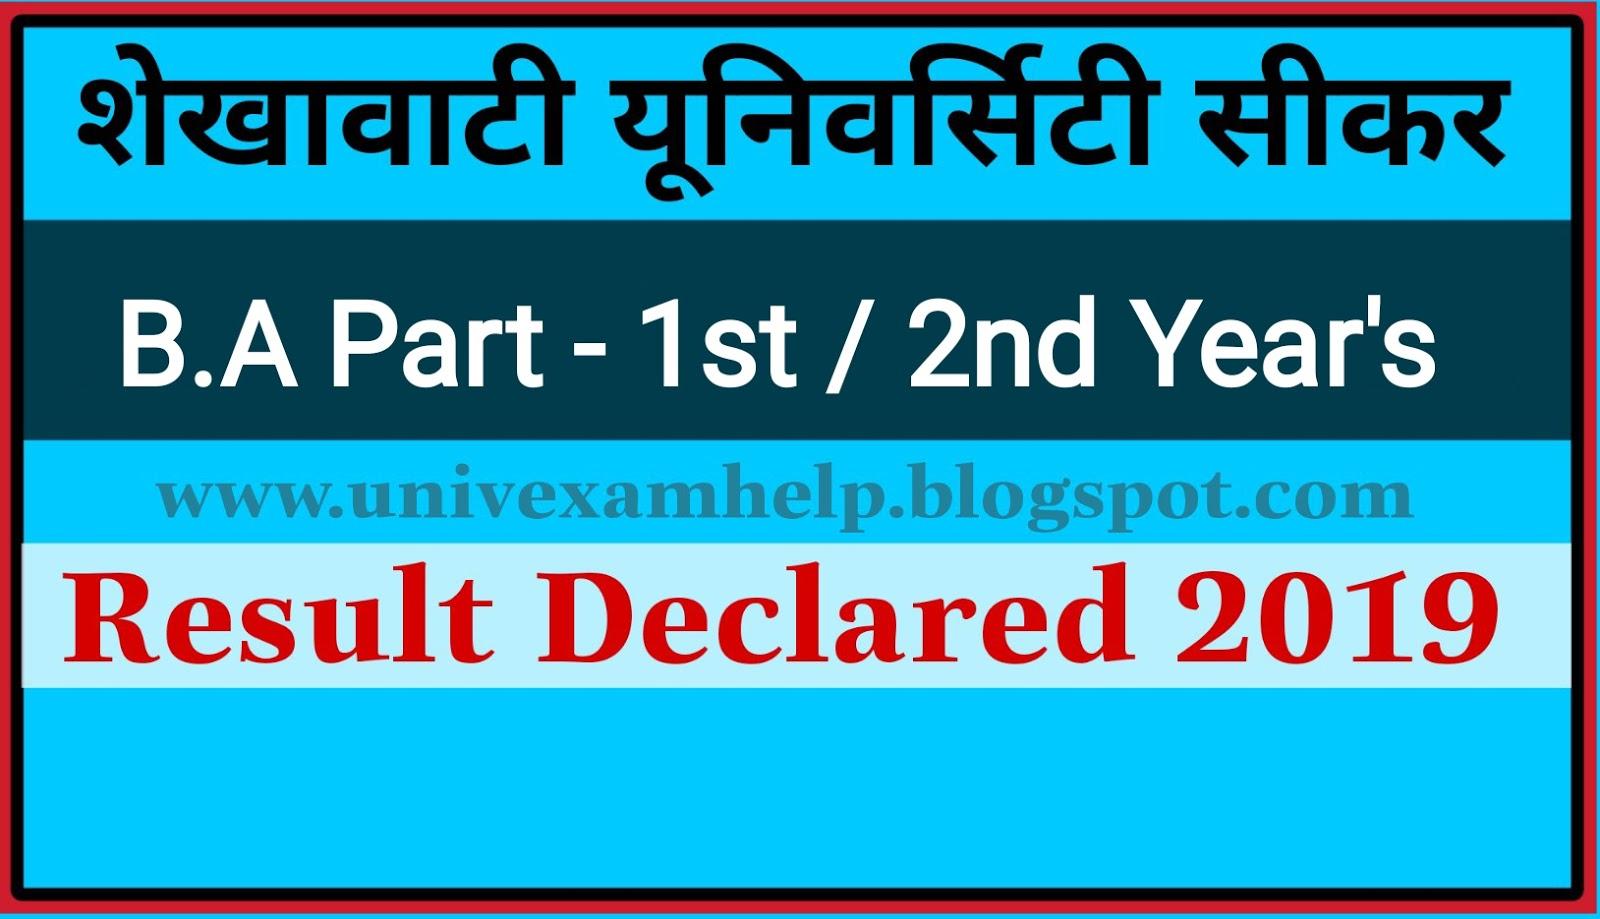 Shekhawati University B A 2nd Year Results Declared 2019 - यहां